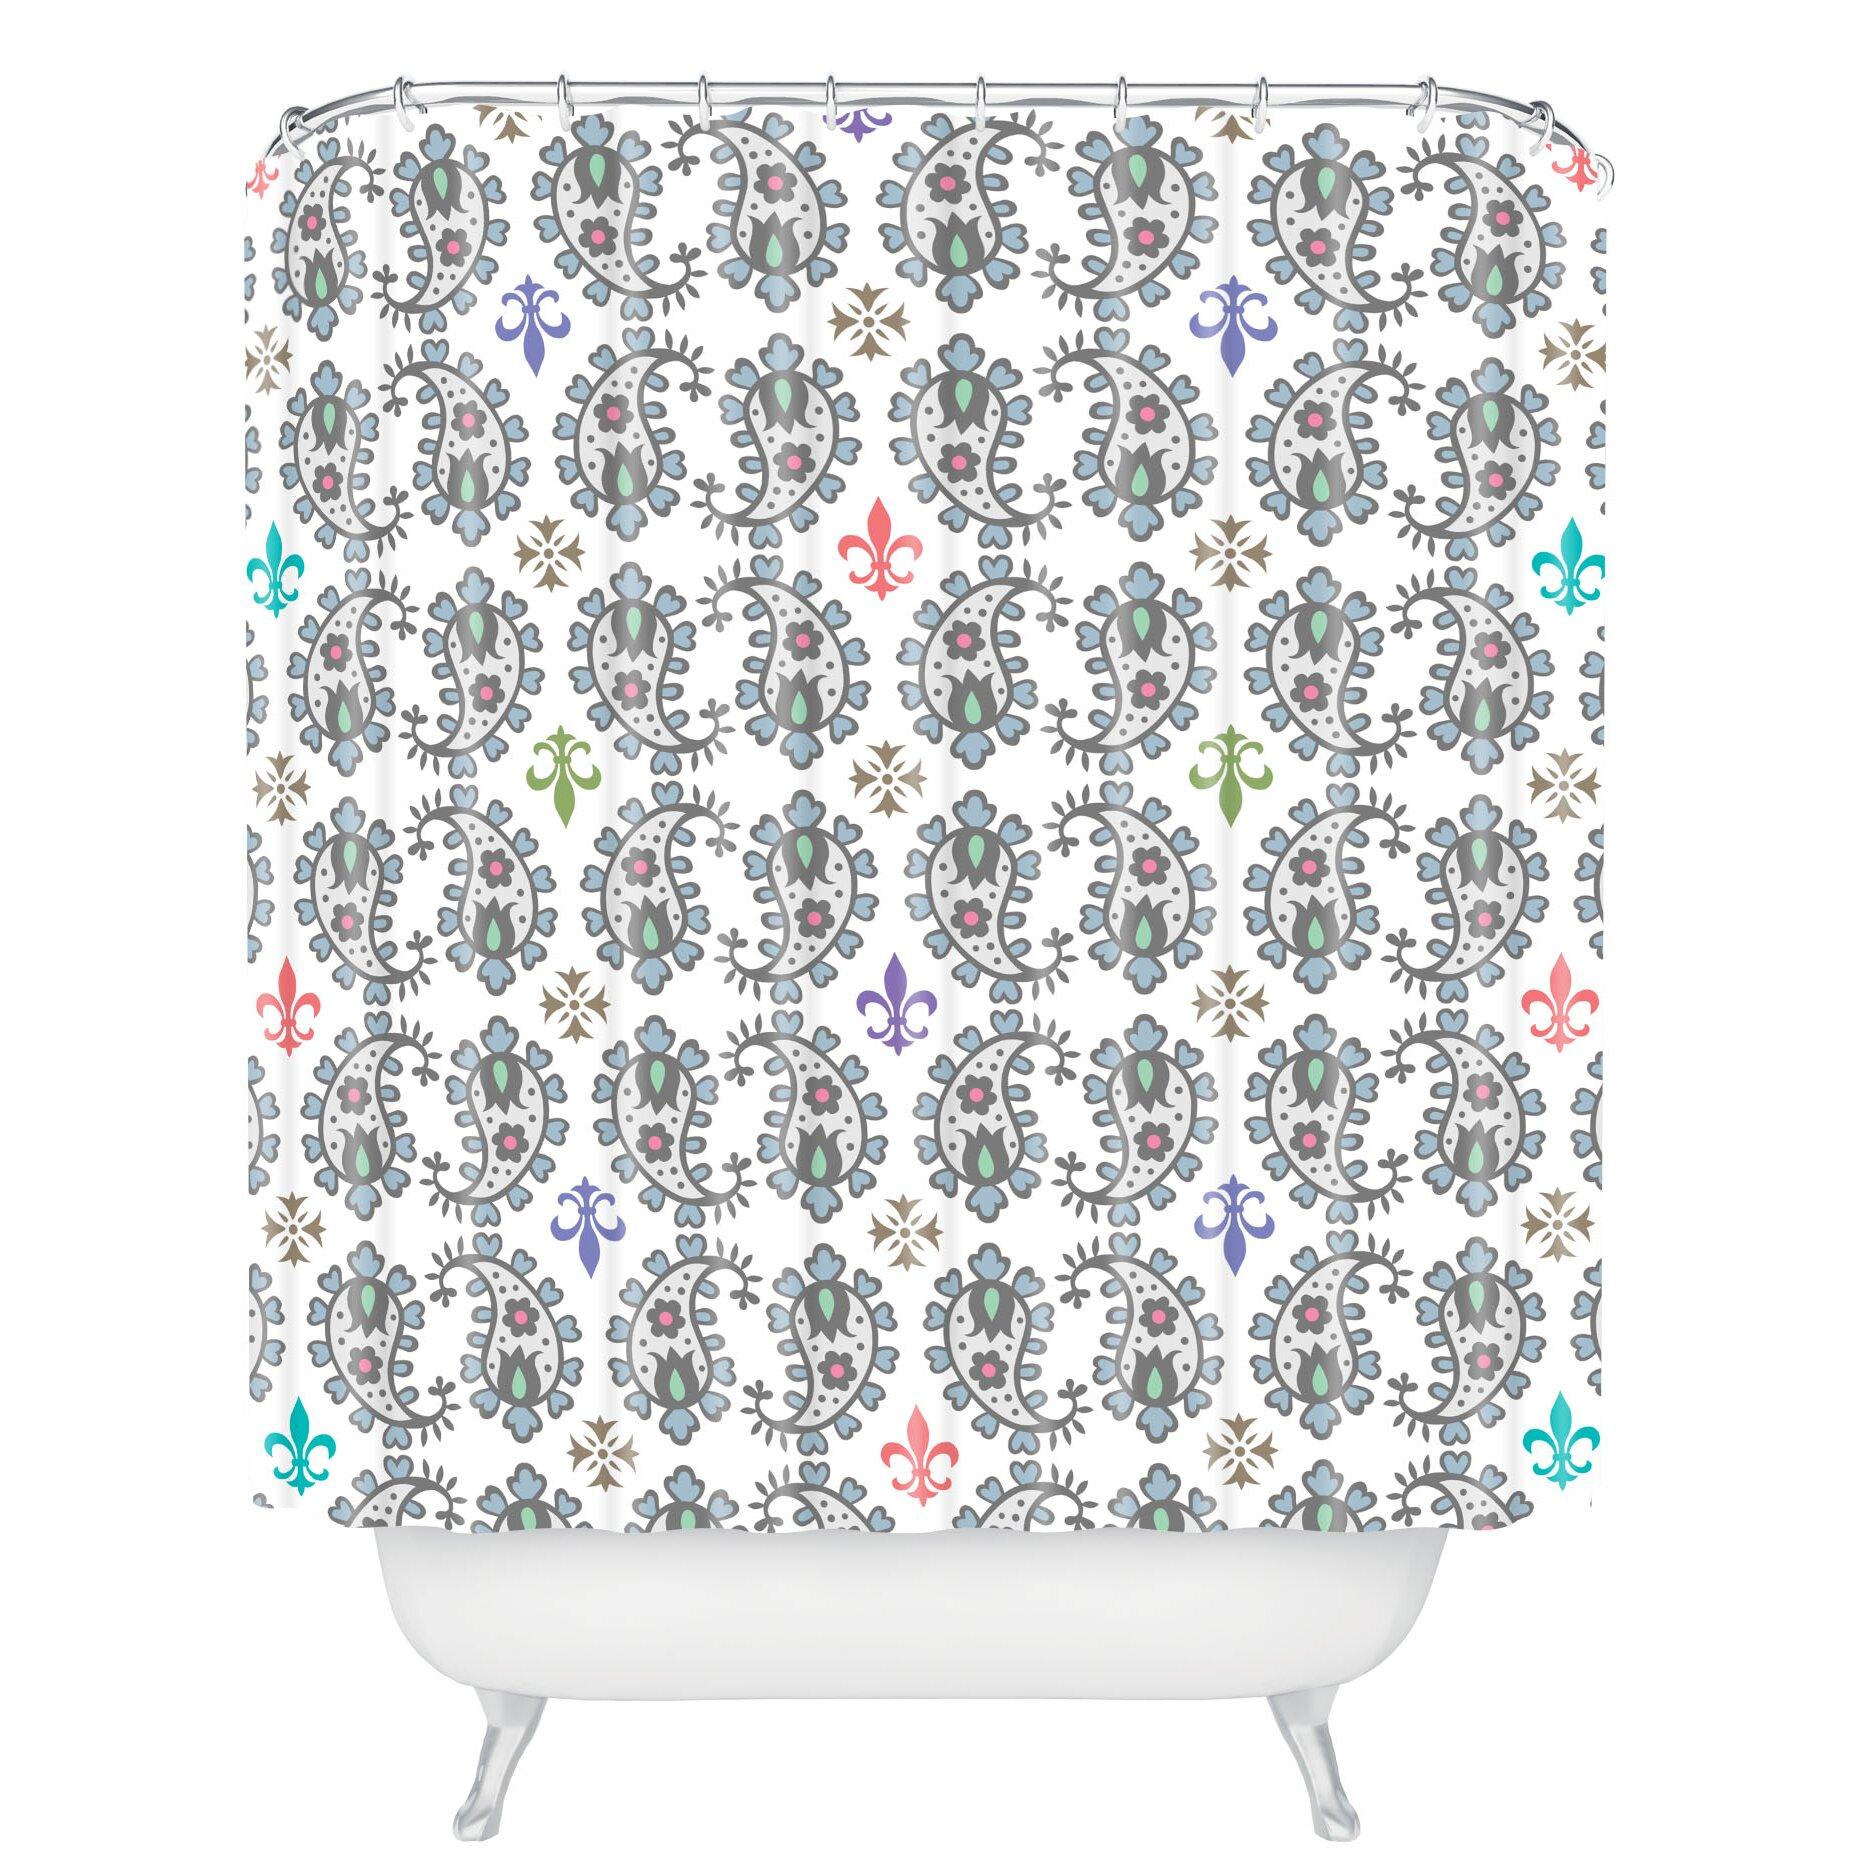 Andi Bird Paisley Ornamental Shower Curtain by DENY Designs